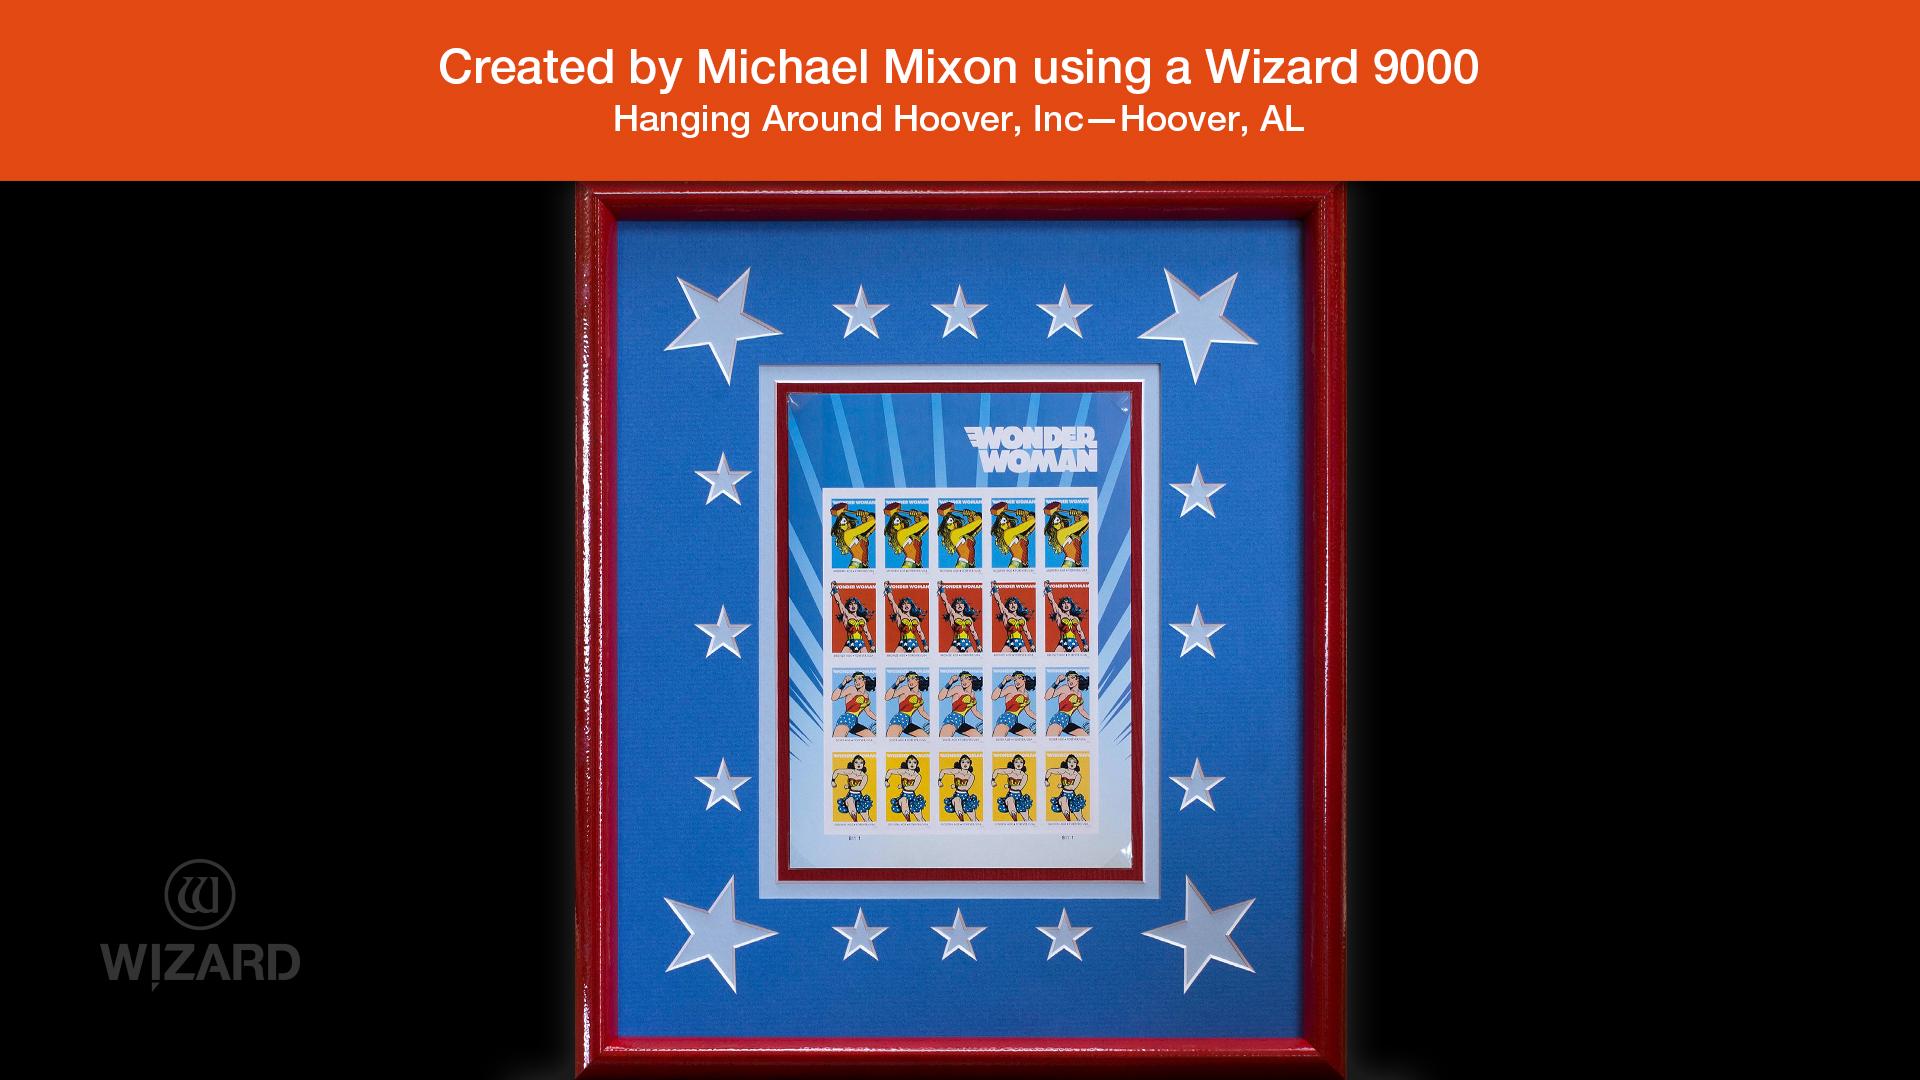 michael-mixon-4.jpg